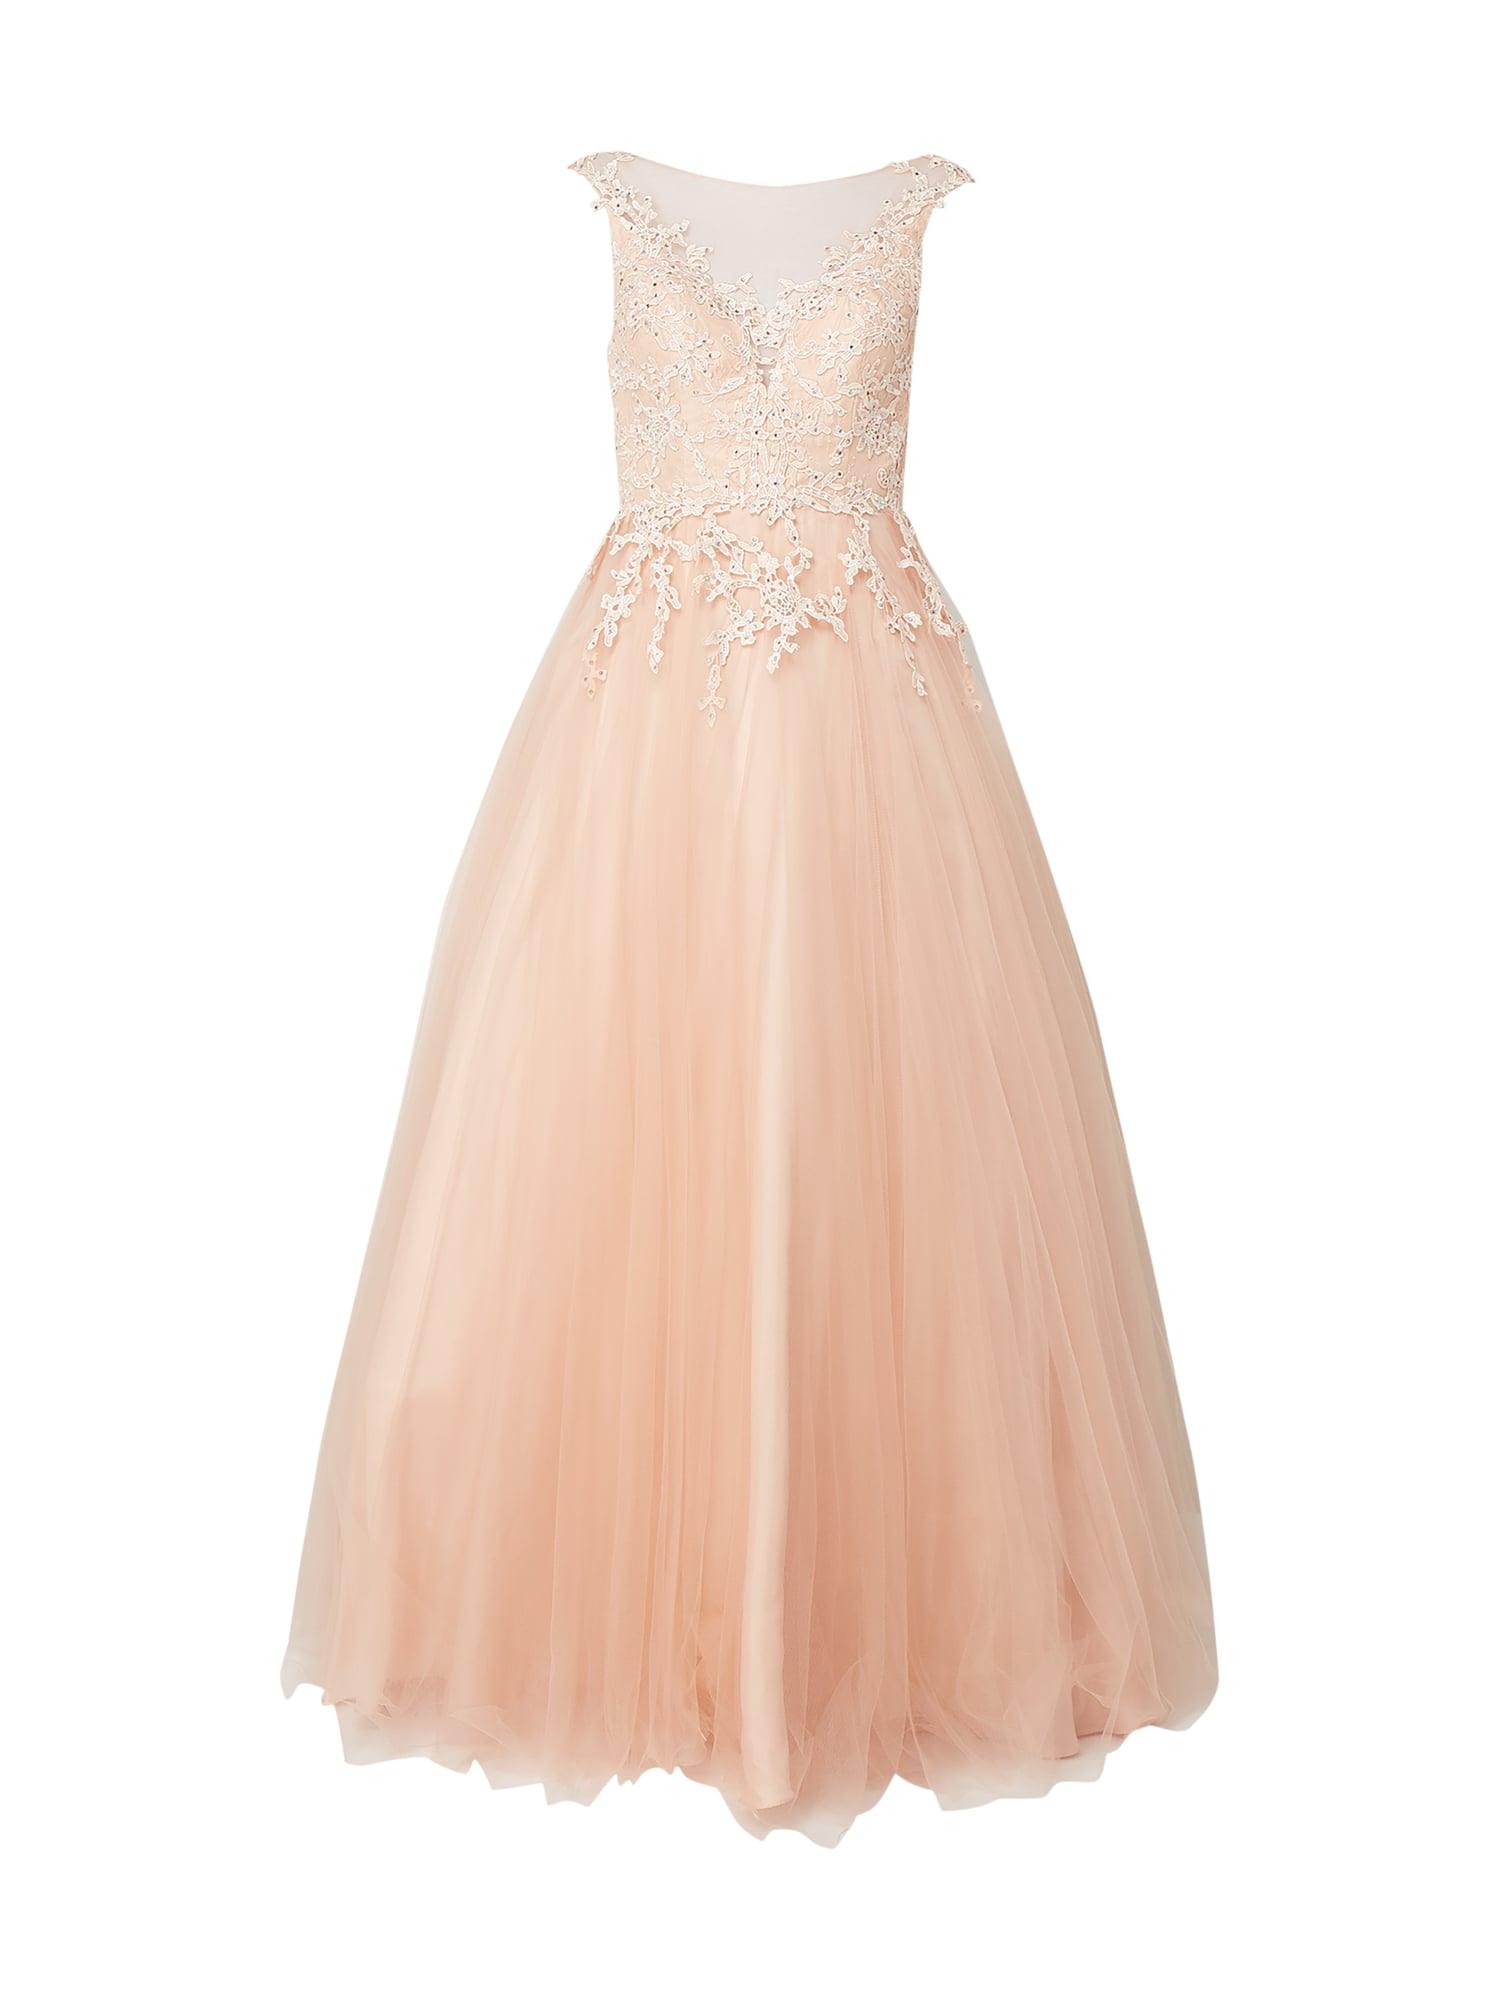 Top Luxuar Limited Abendkleid Spezialgebiet20 Erstaunlich Luxuar Limited Abendkleid Ärmel